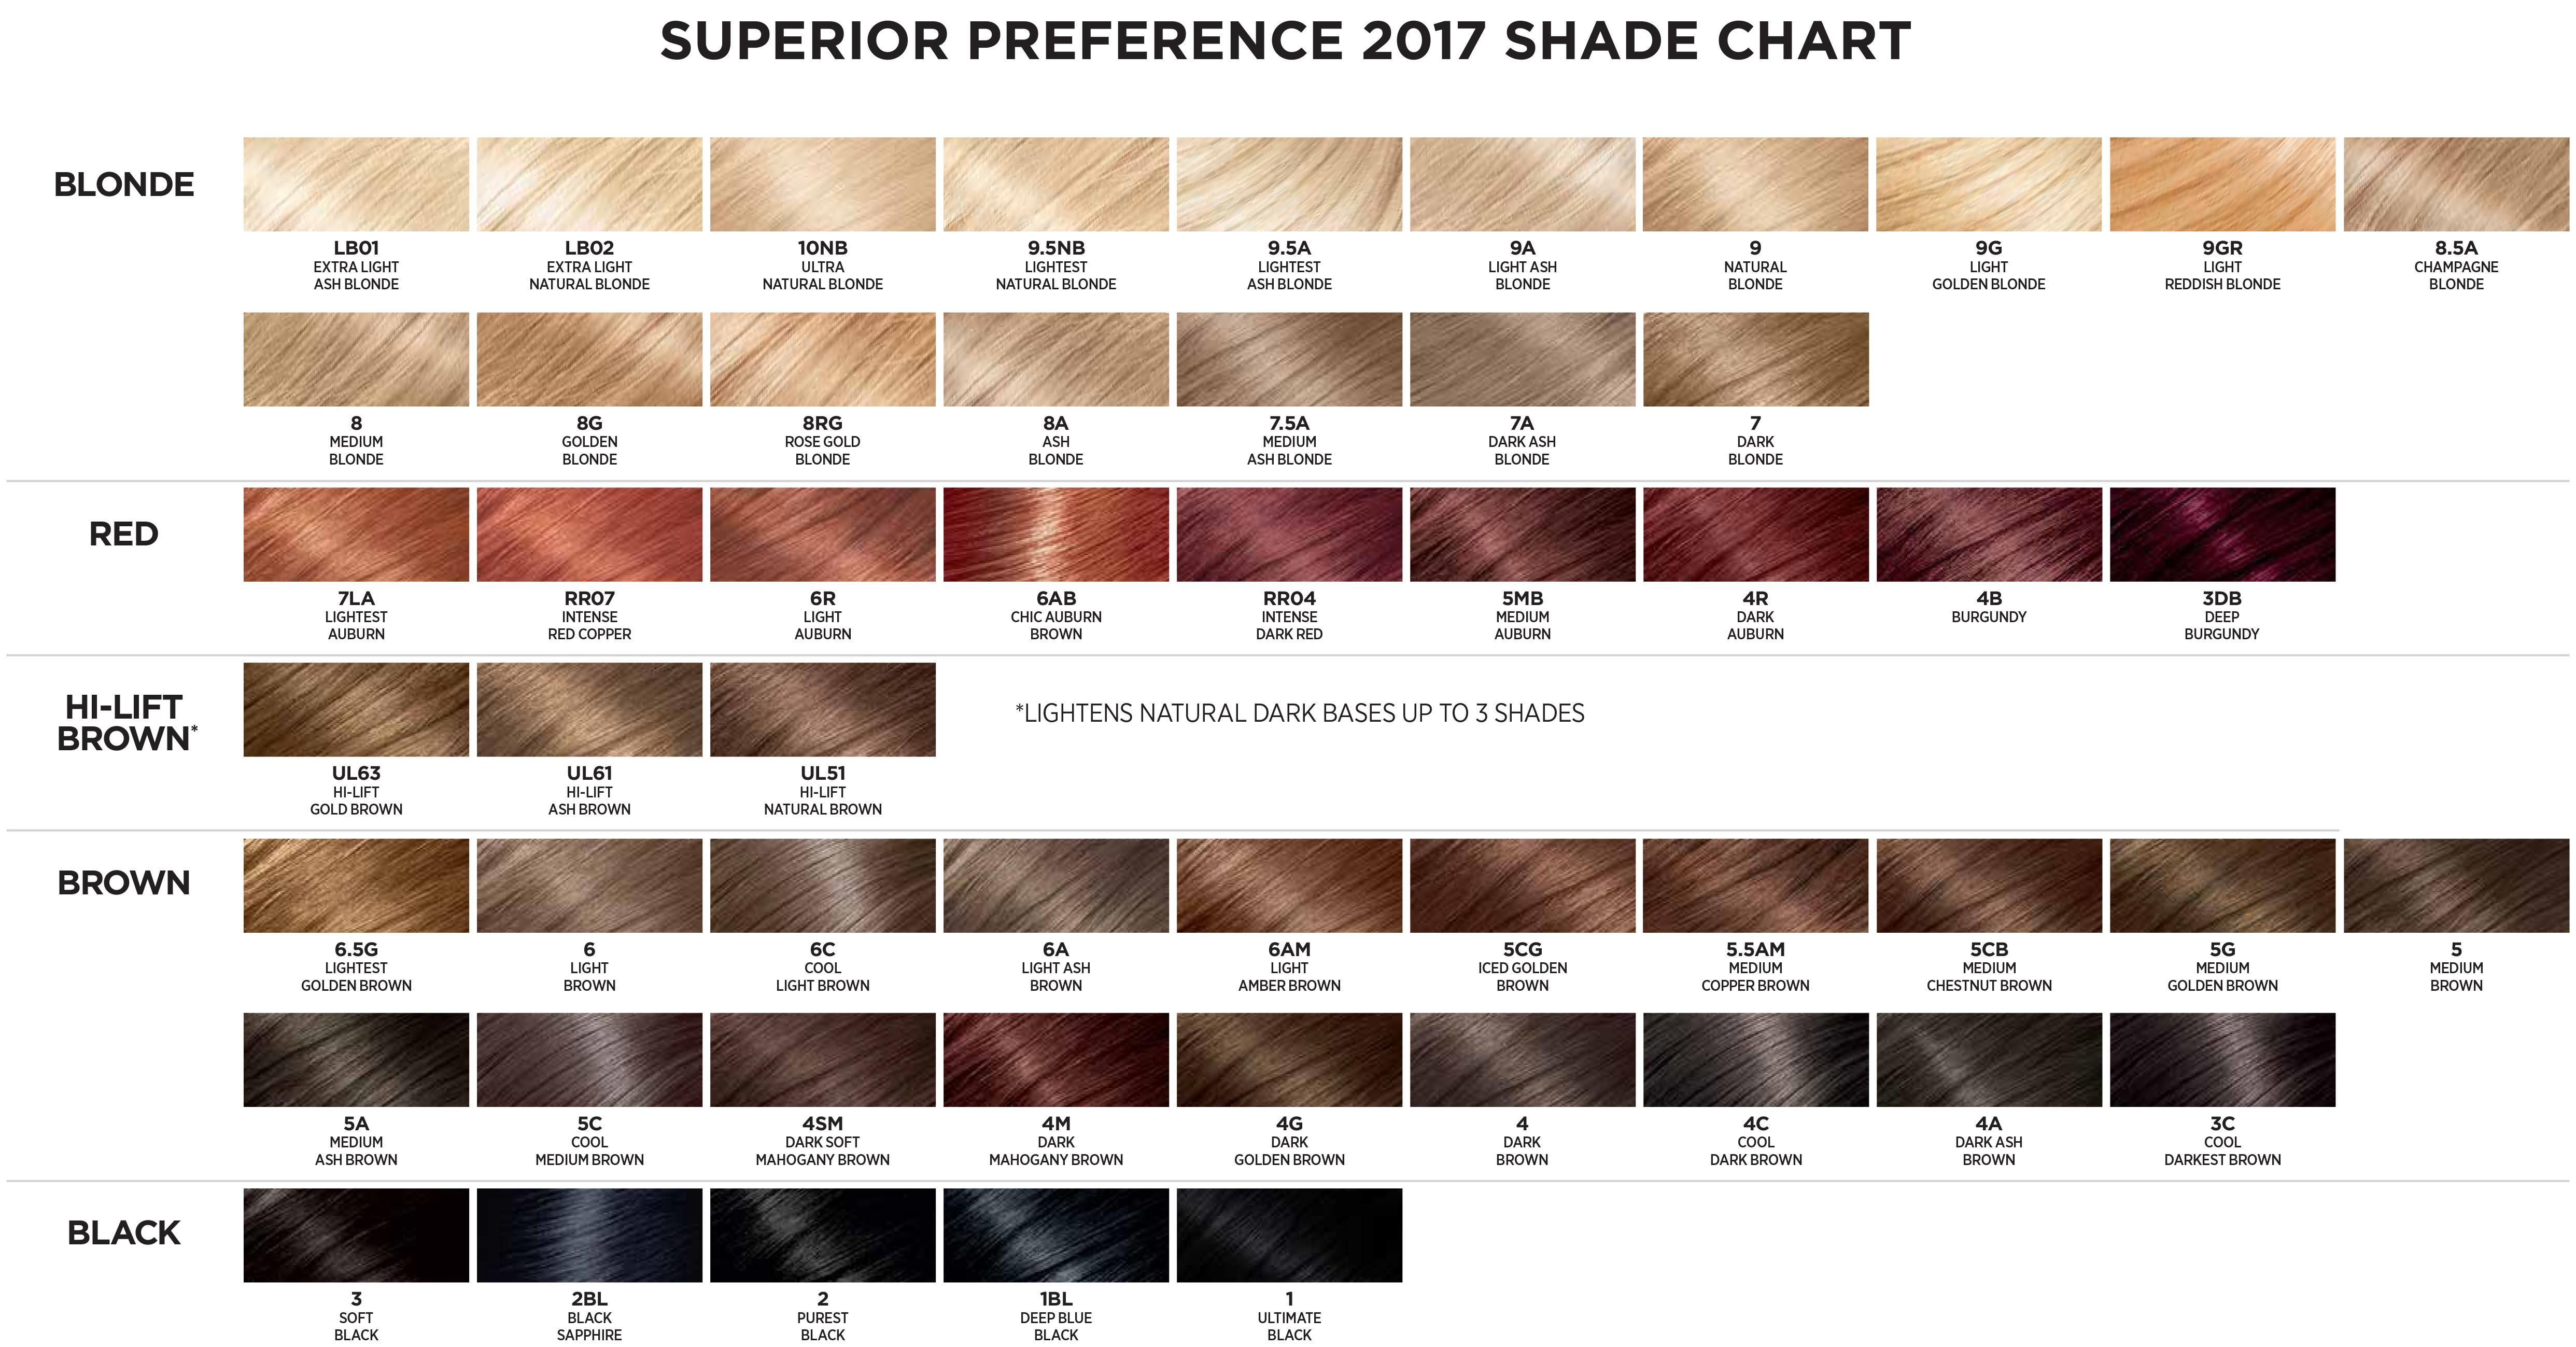 Hair Color Chart Loreal Preference Hair Color Loreal Hair Color Chart